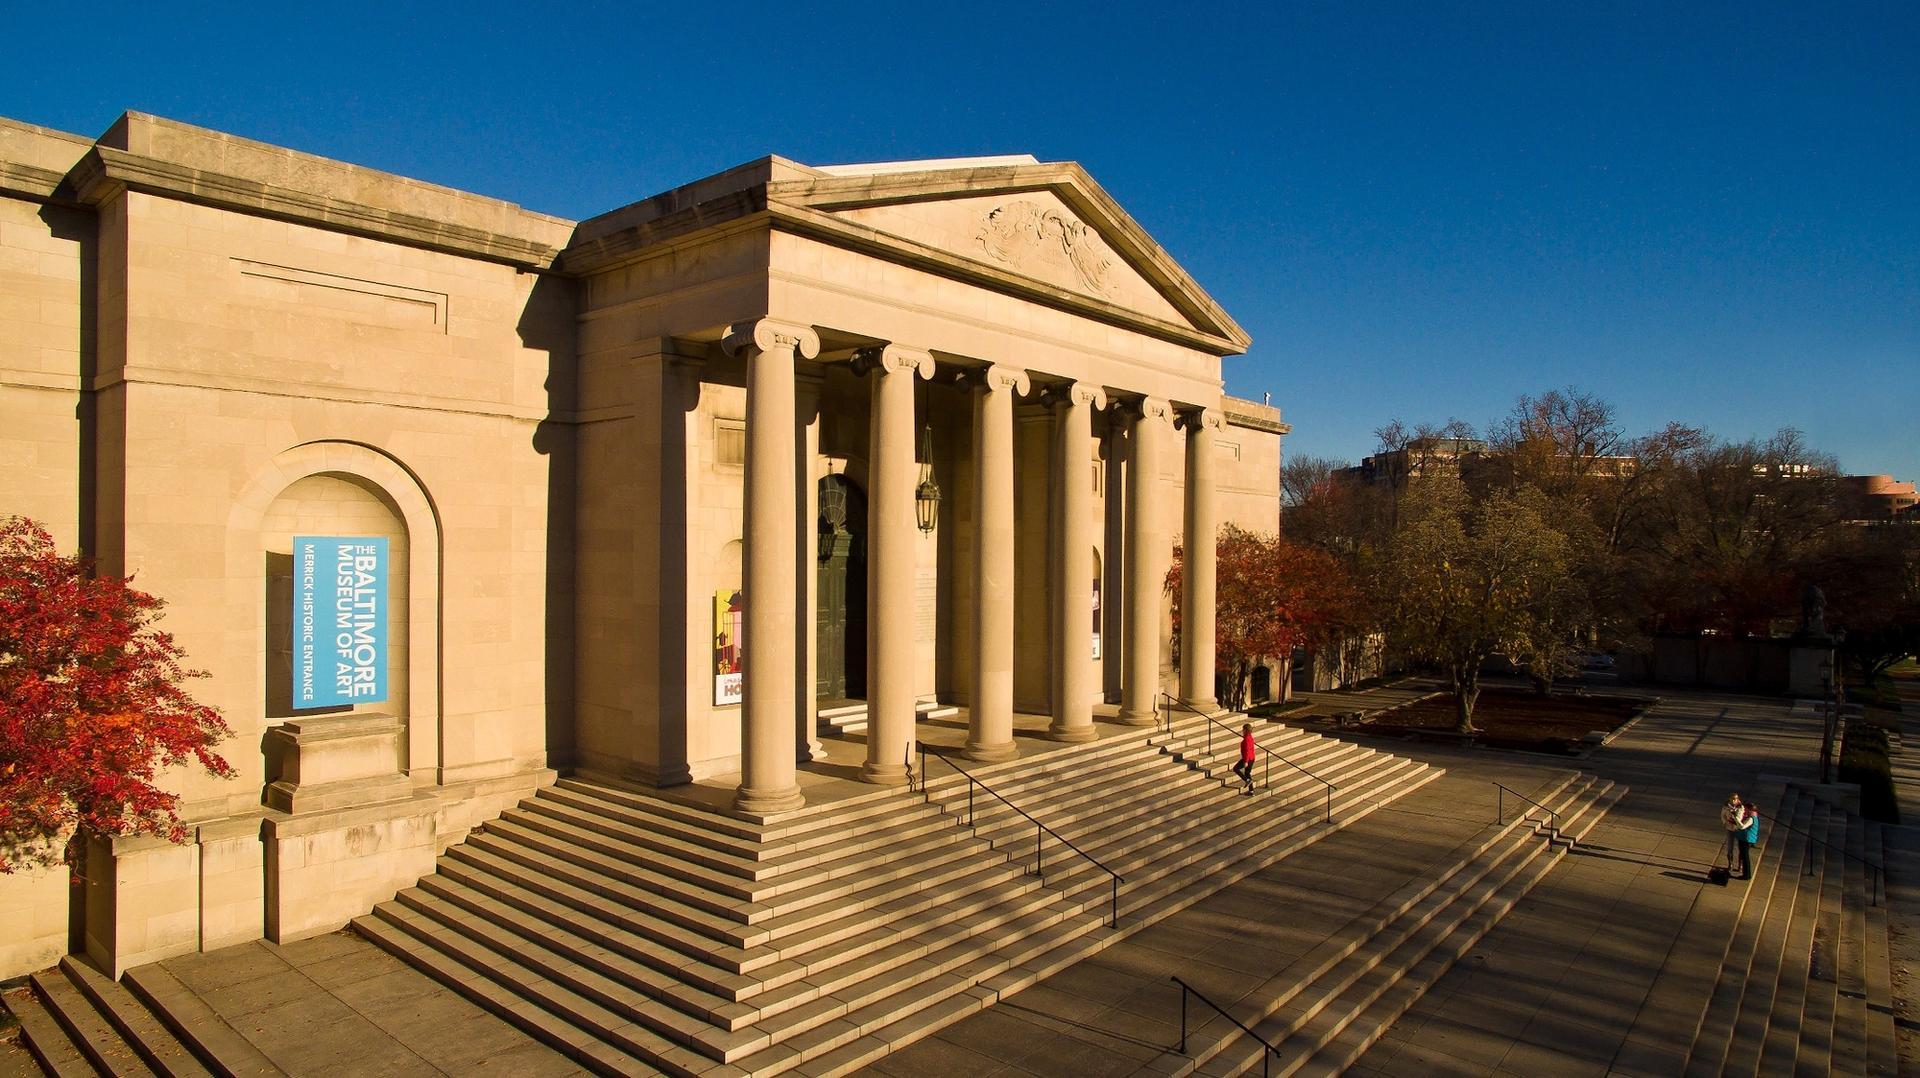 The Baltimore Museum of Art Photo: Stephen Spartana